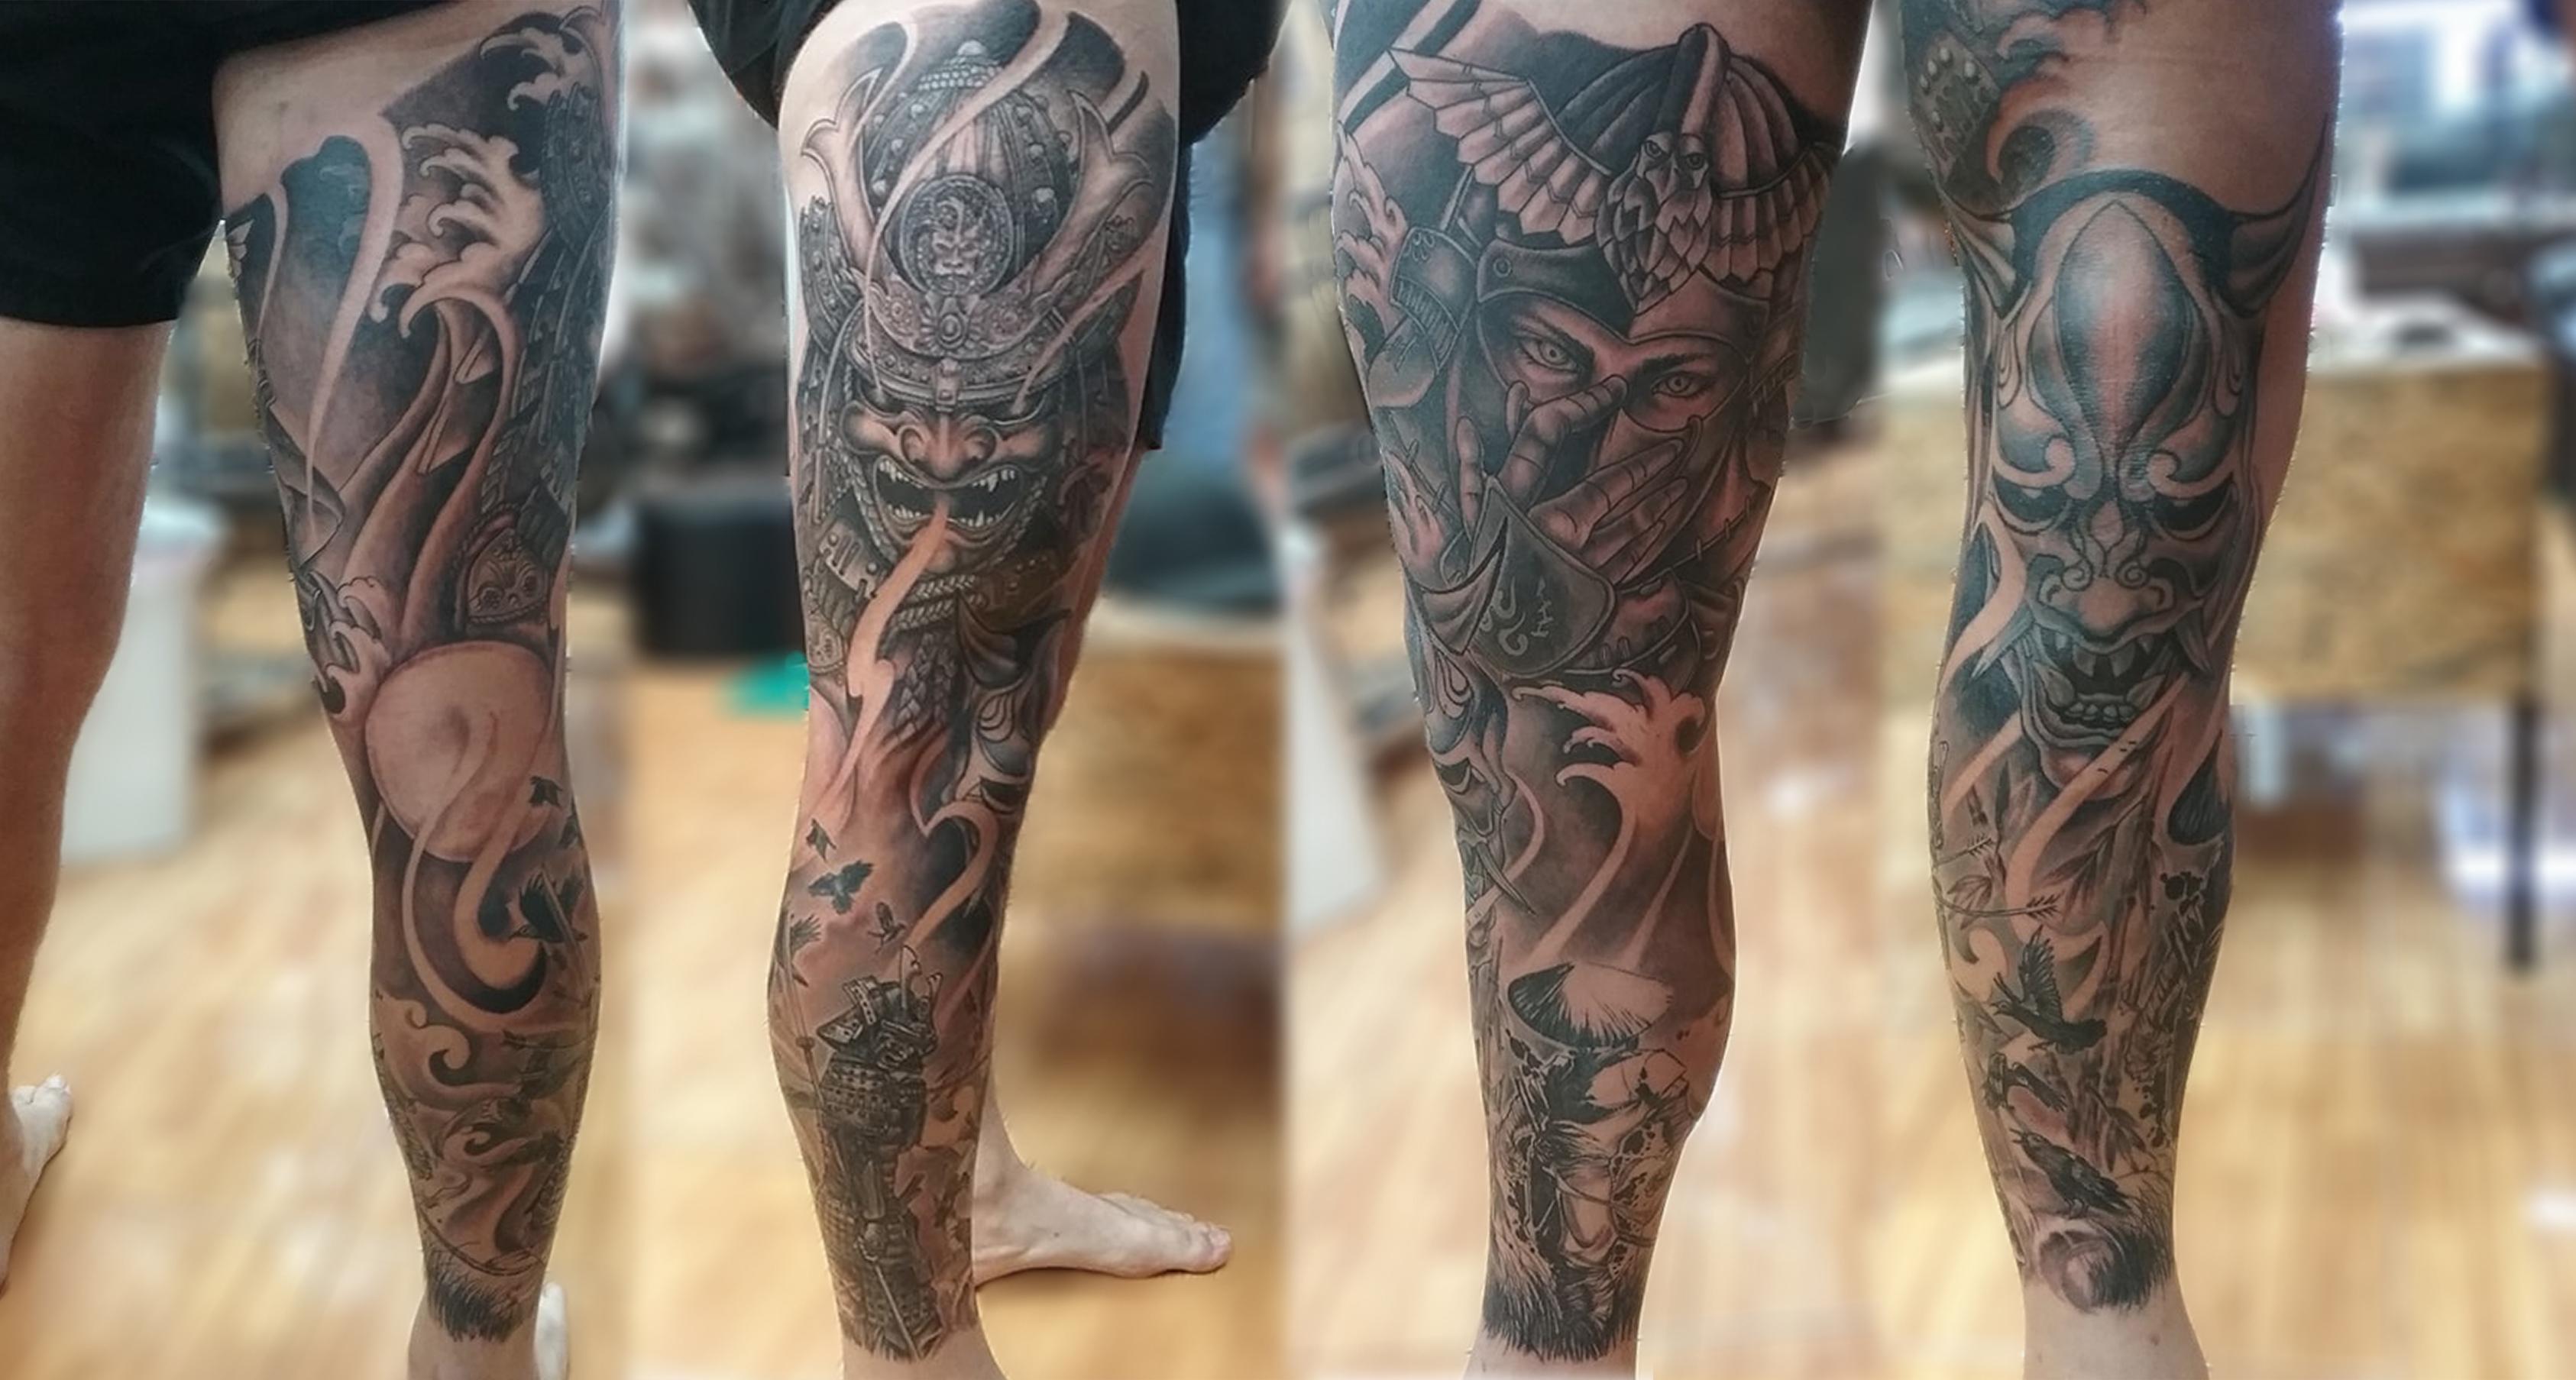 Beautiful тату в японском стиле на ноге